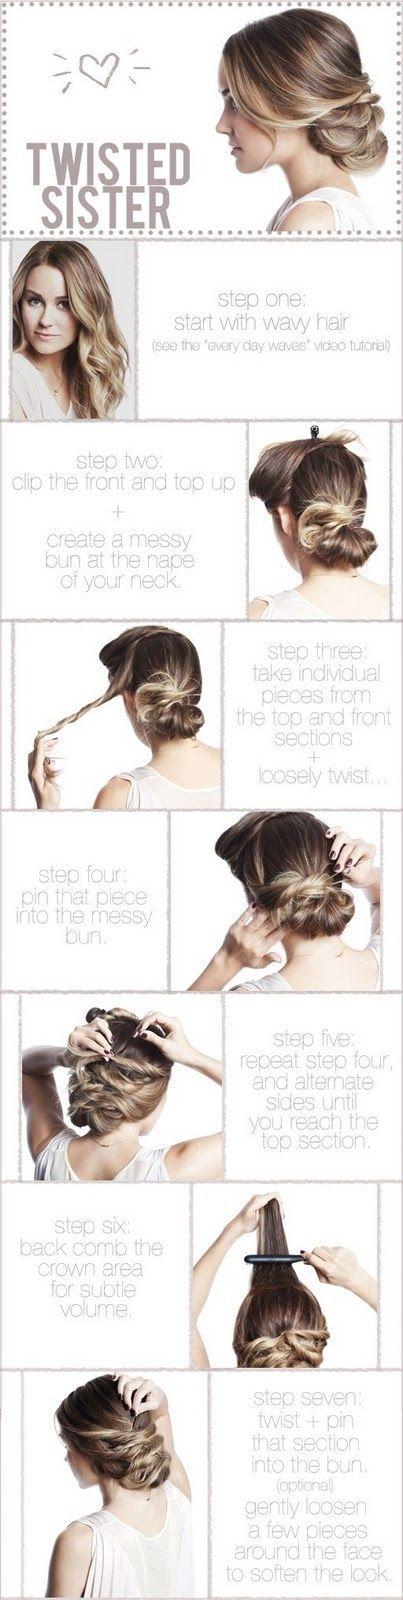 Boho Twisted Updo Hairstyle Tutorial